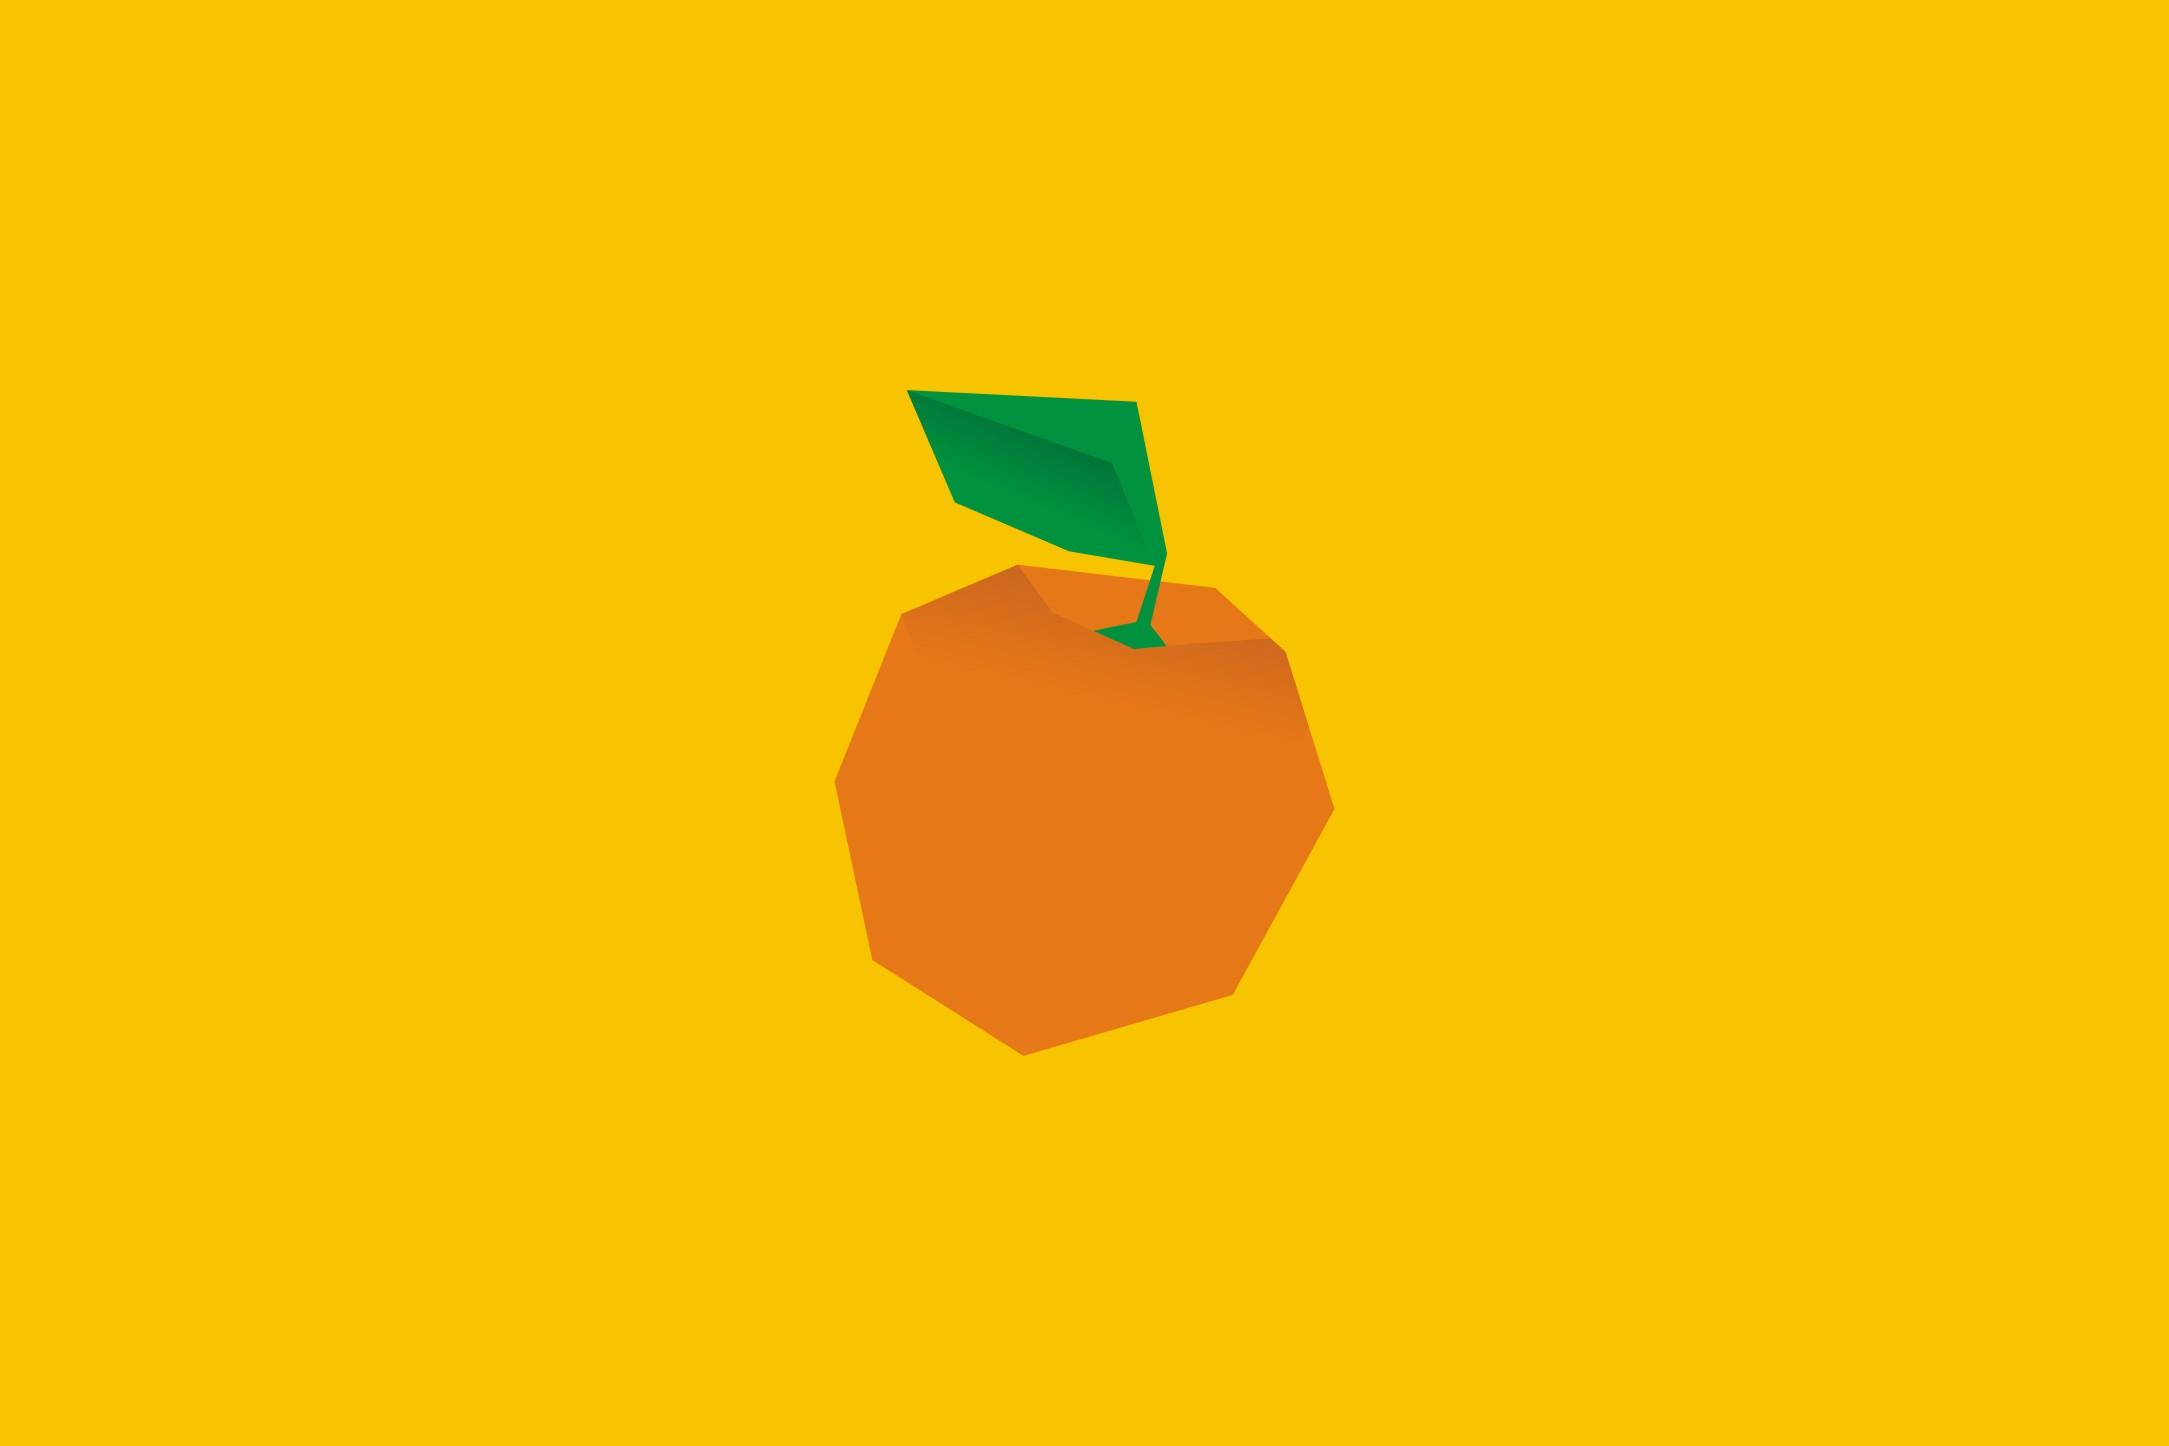 7 Manfaat tersembunyi di balik kulit jeruk yang tak kamu sadari